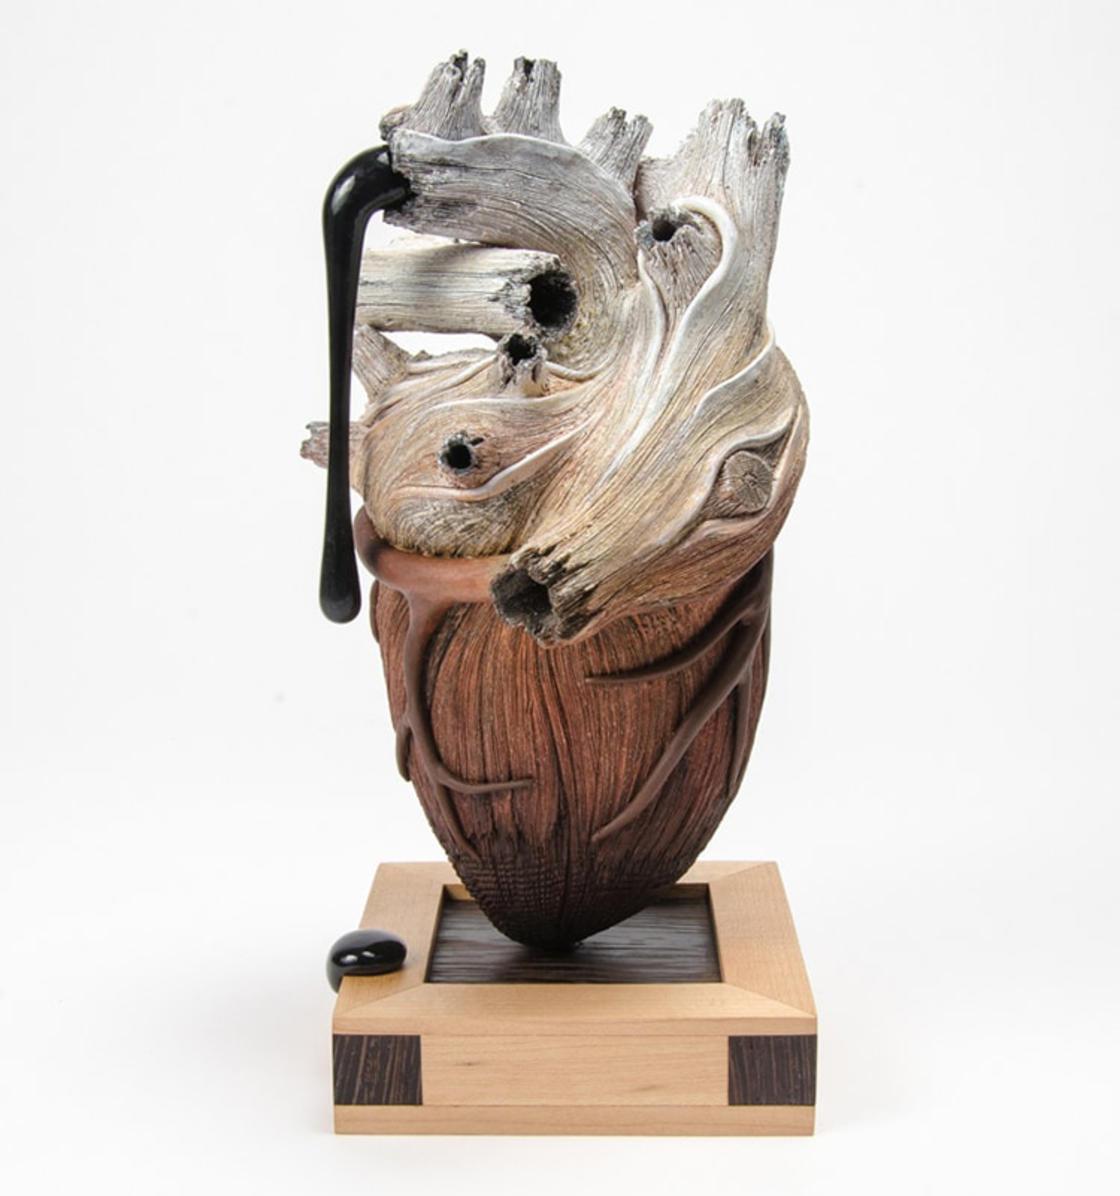 The impressive ceramic sculptures of Christopher David White